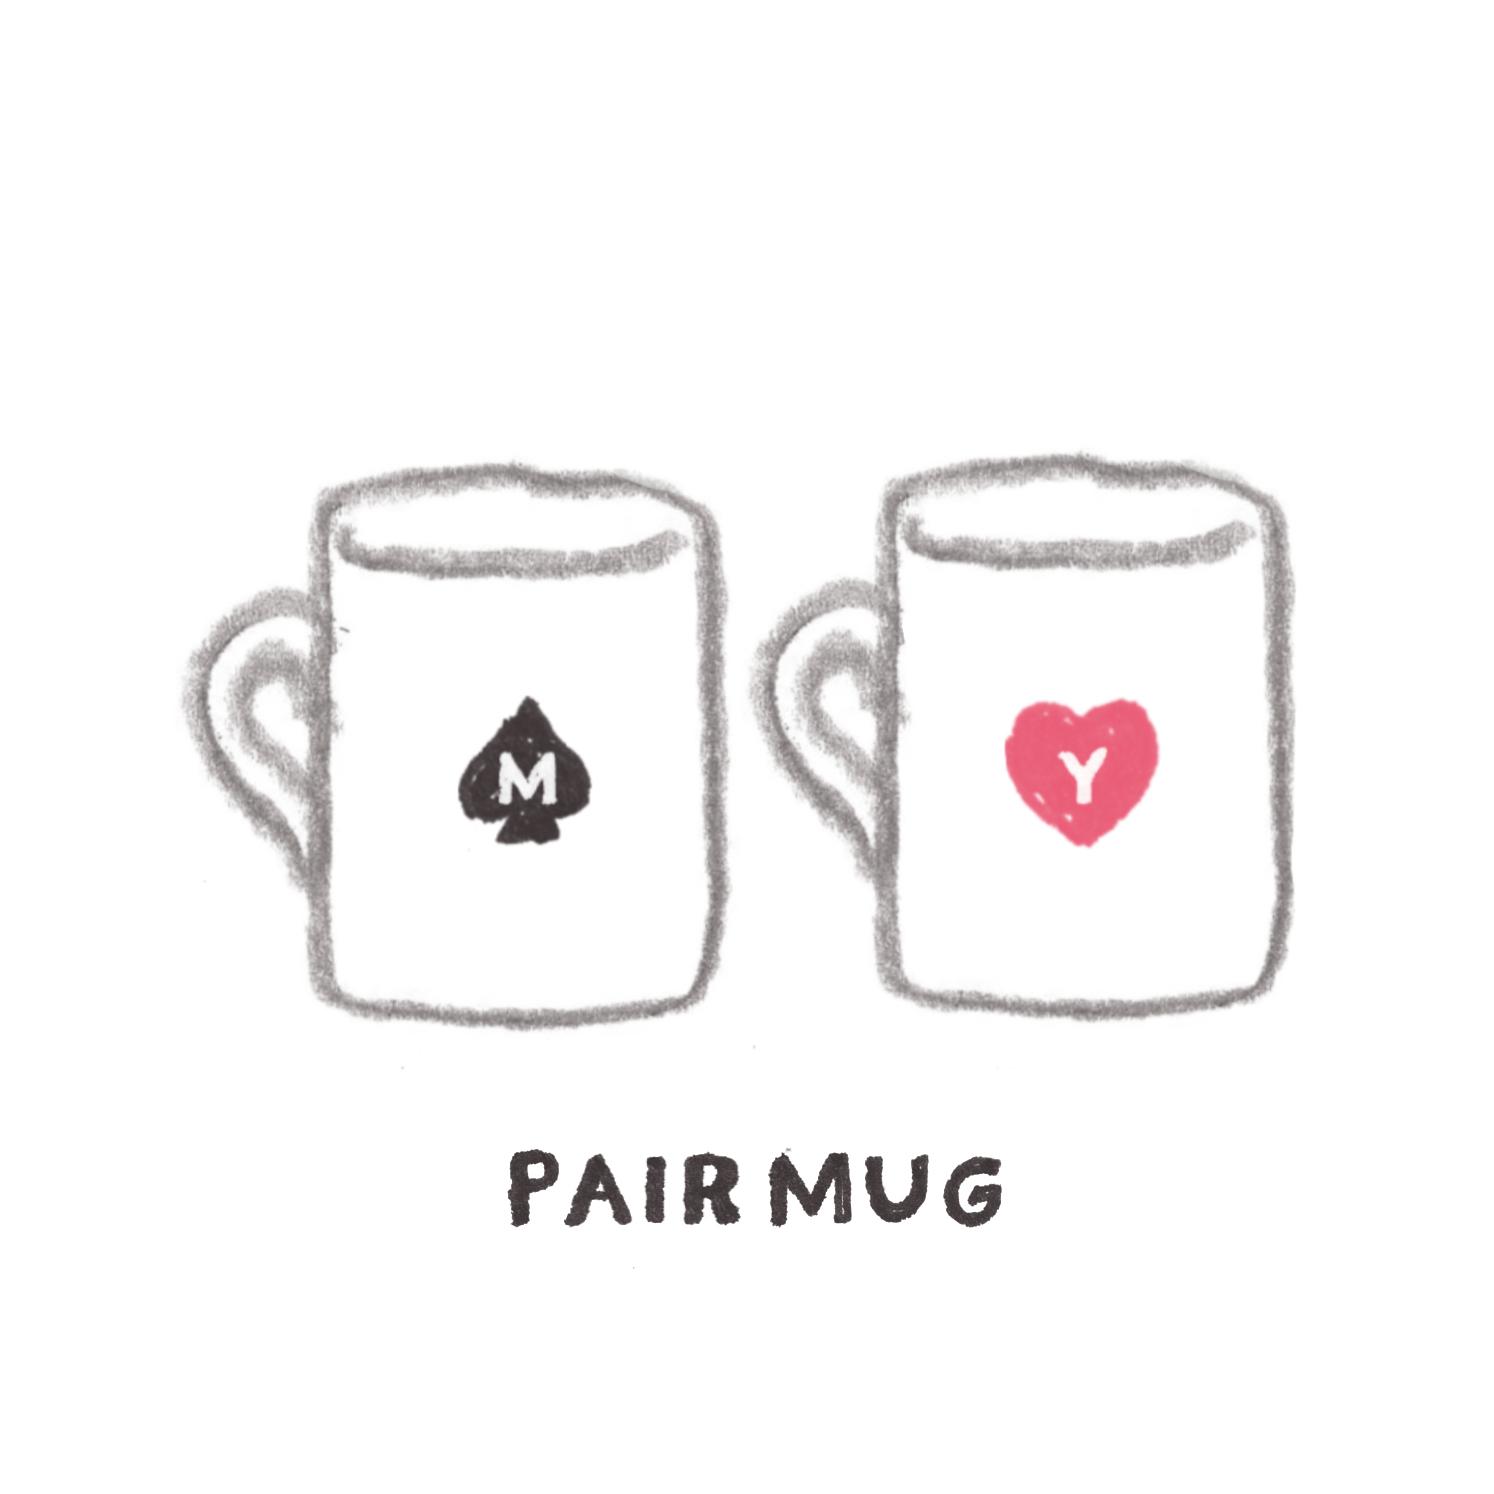 D:夫婦のネーム入りマグカップ